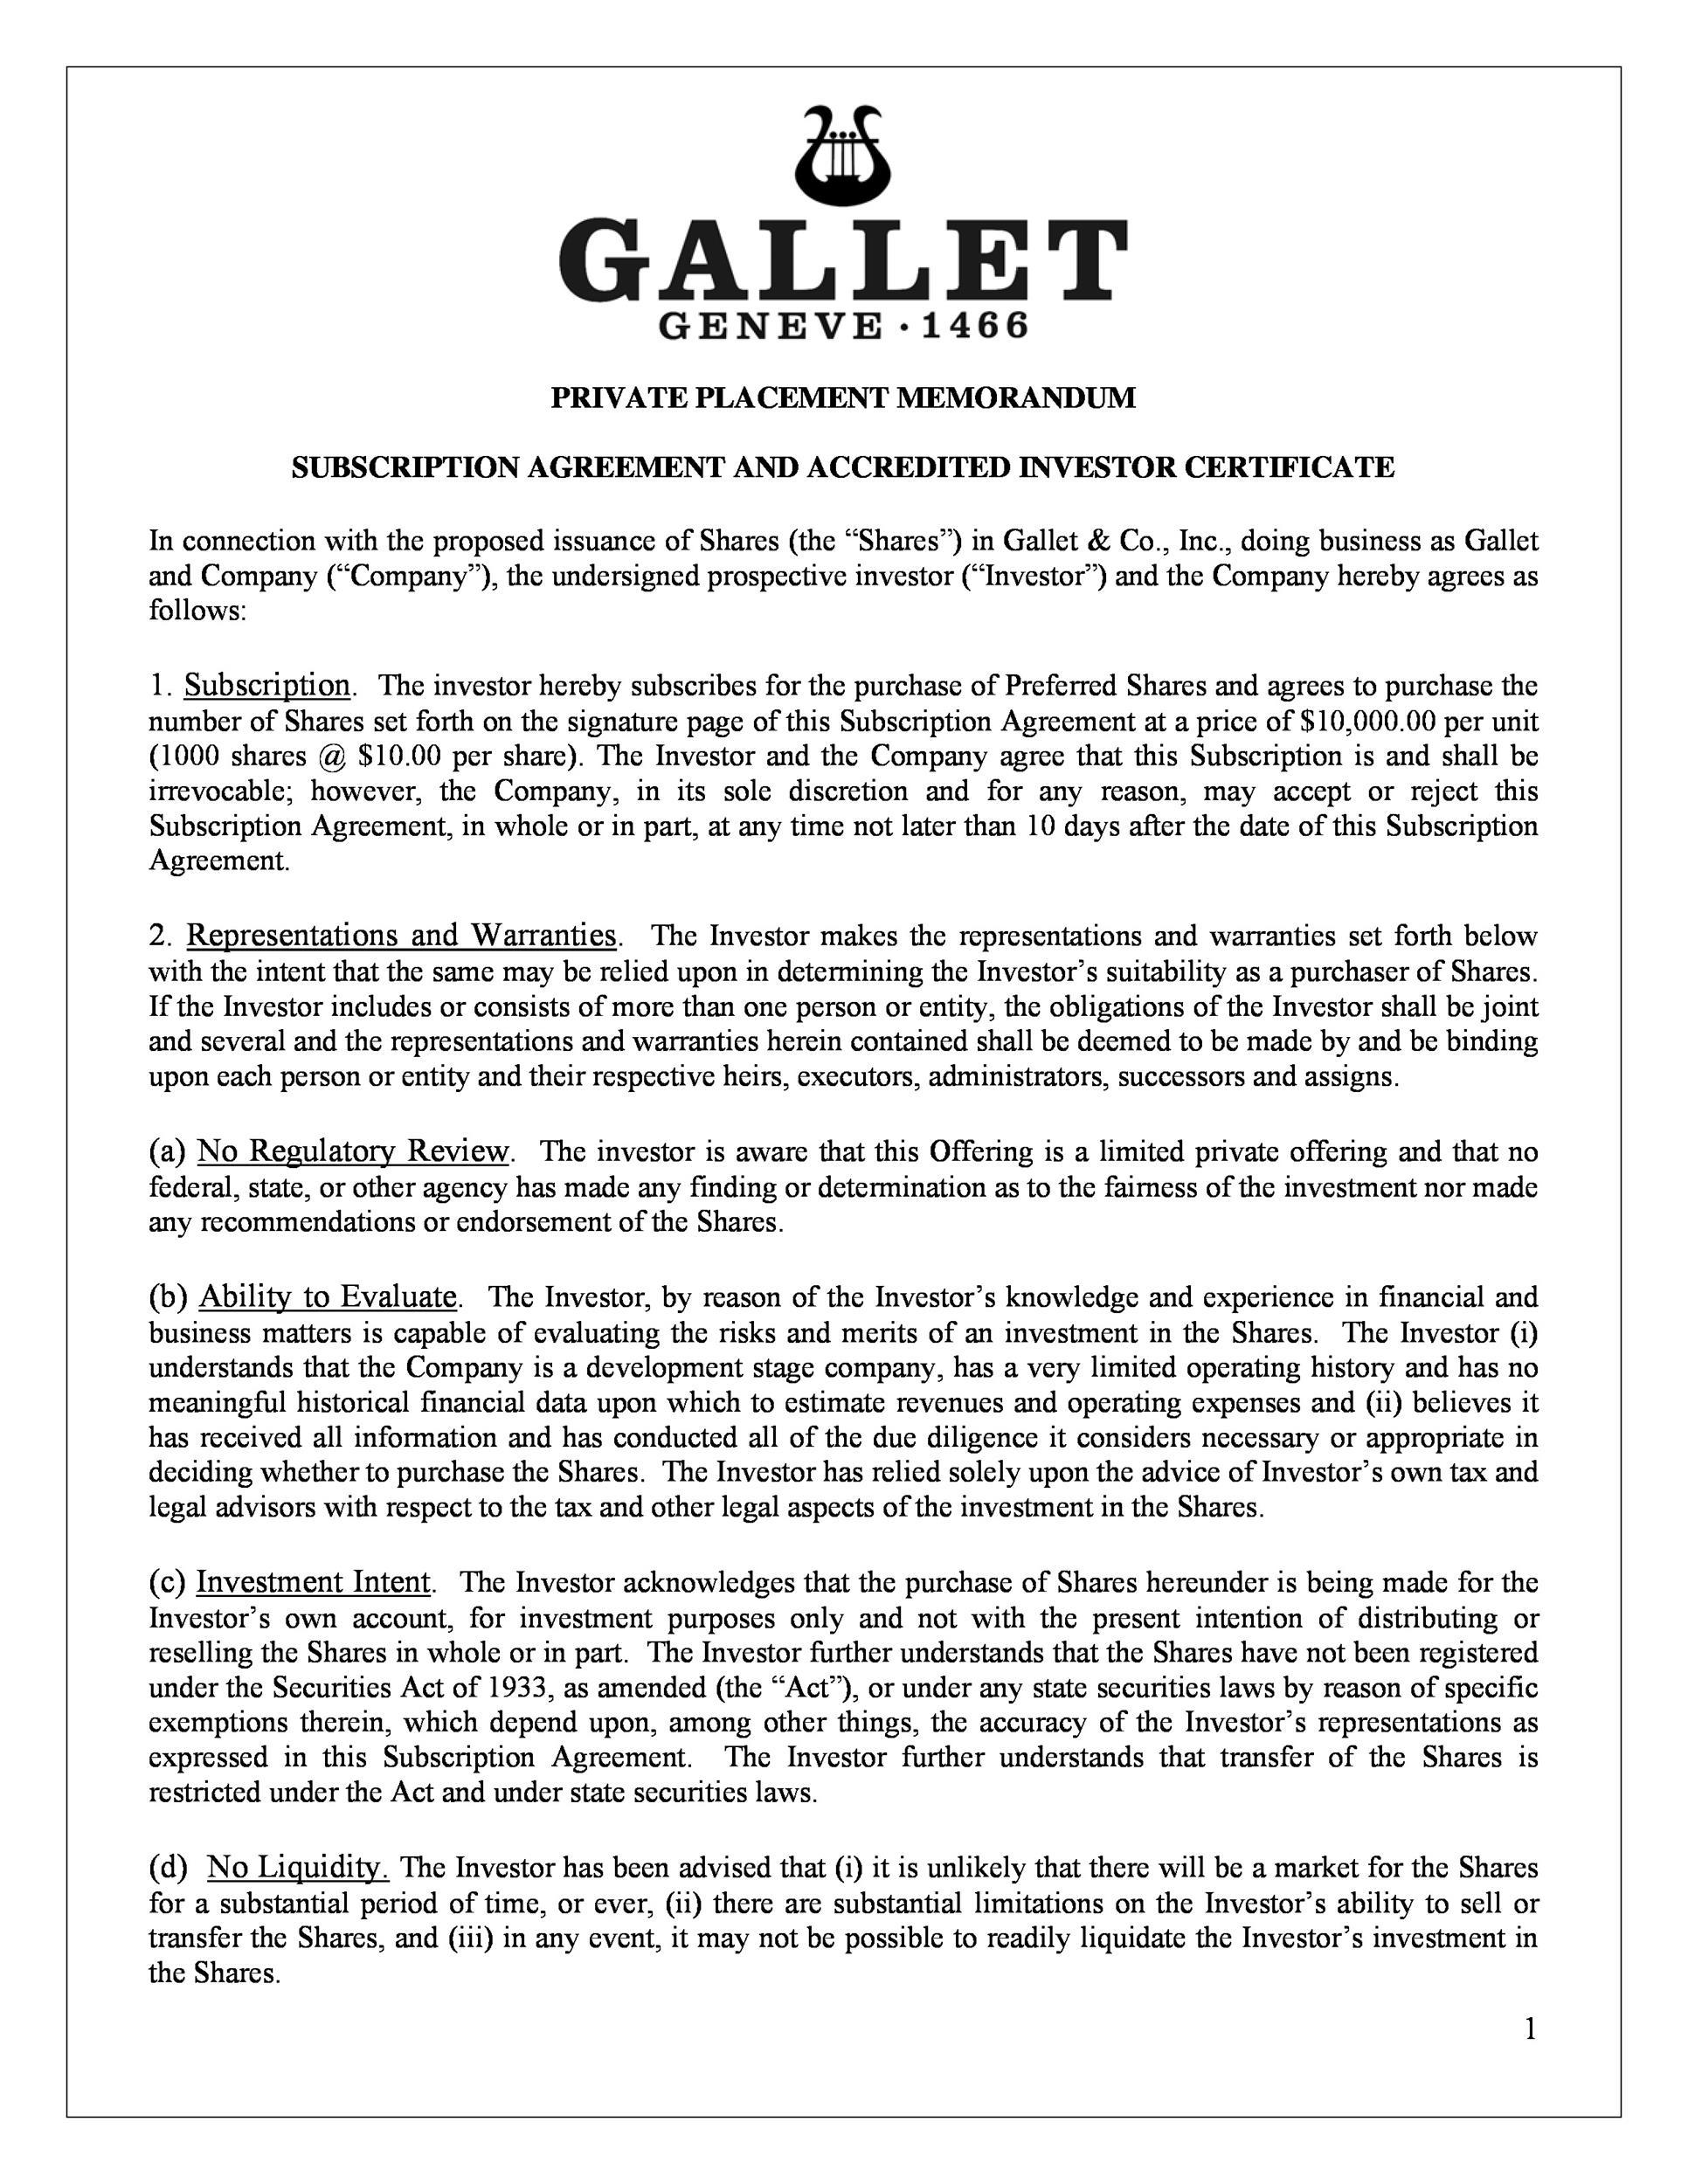 Free private placement memorandum template 41